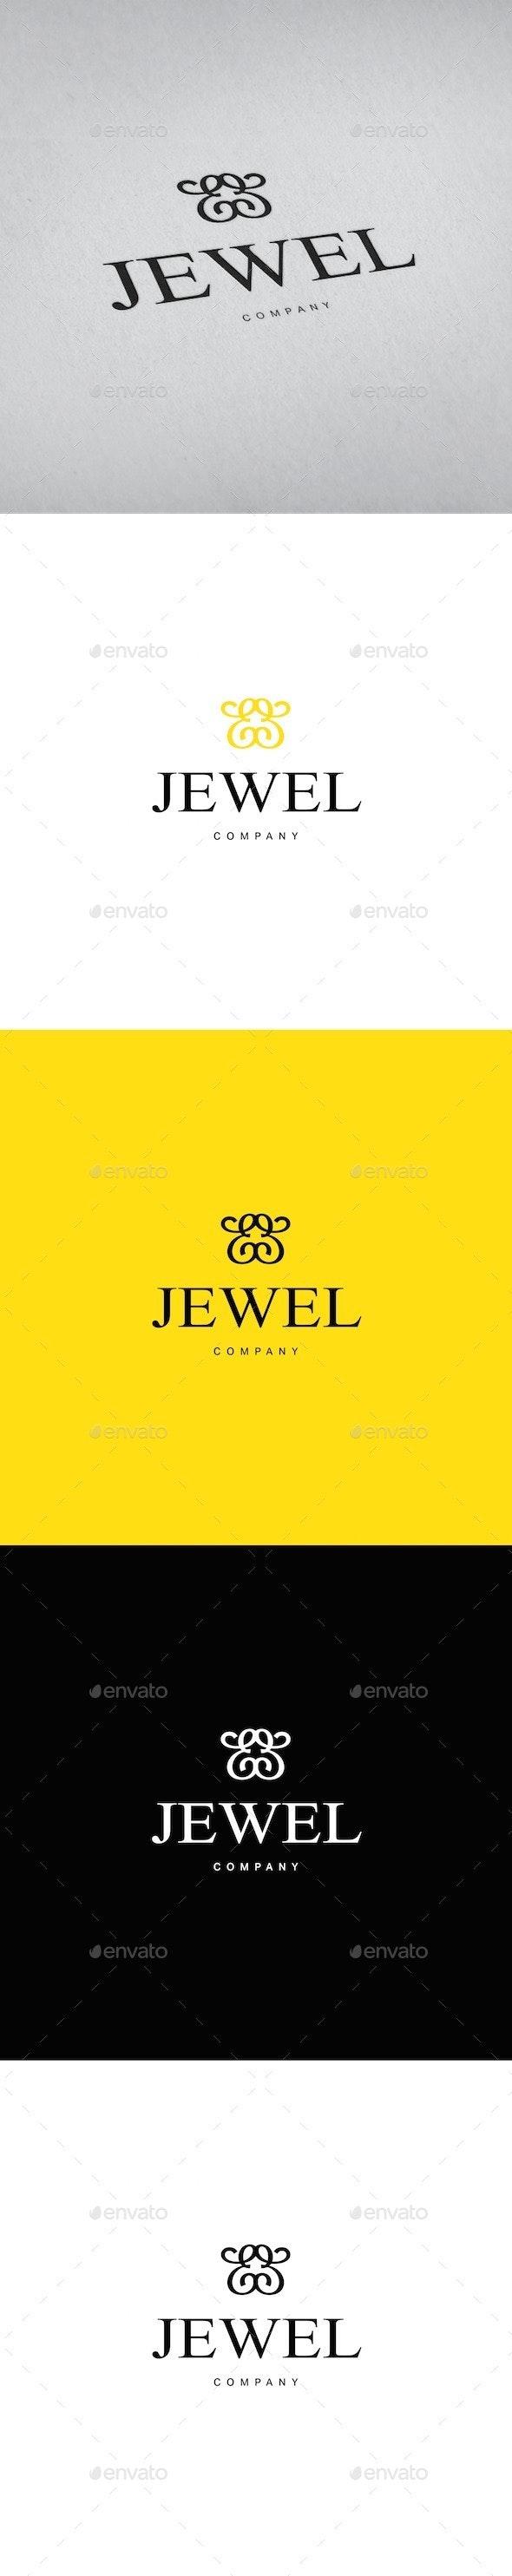 Jewellery Ornament Logo Template - Objects Logo Templates